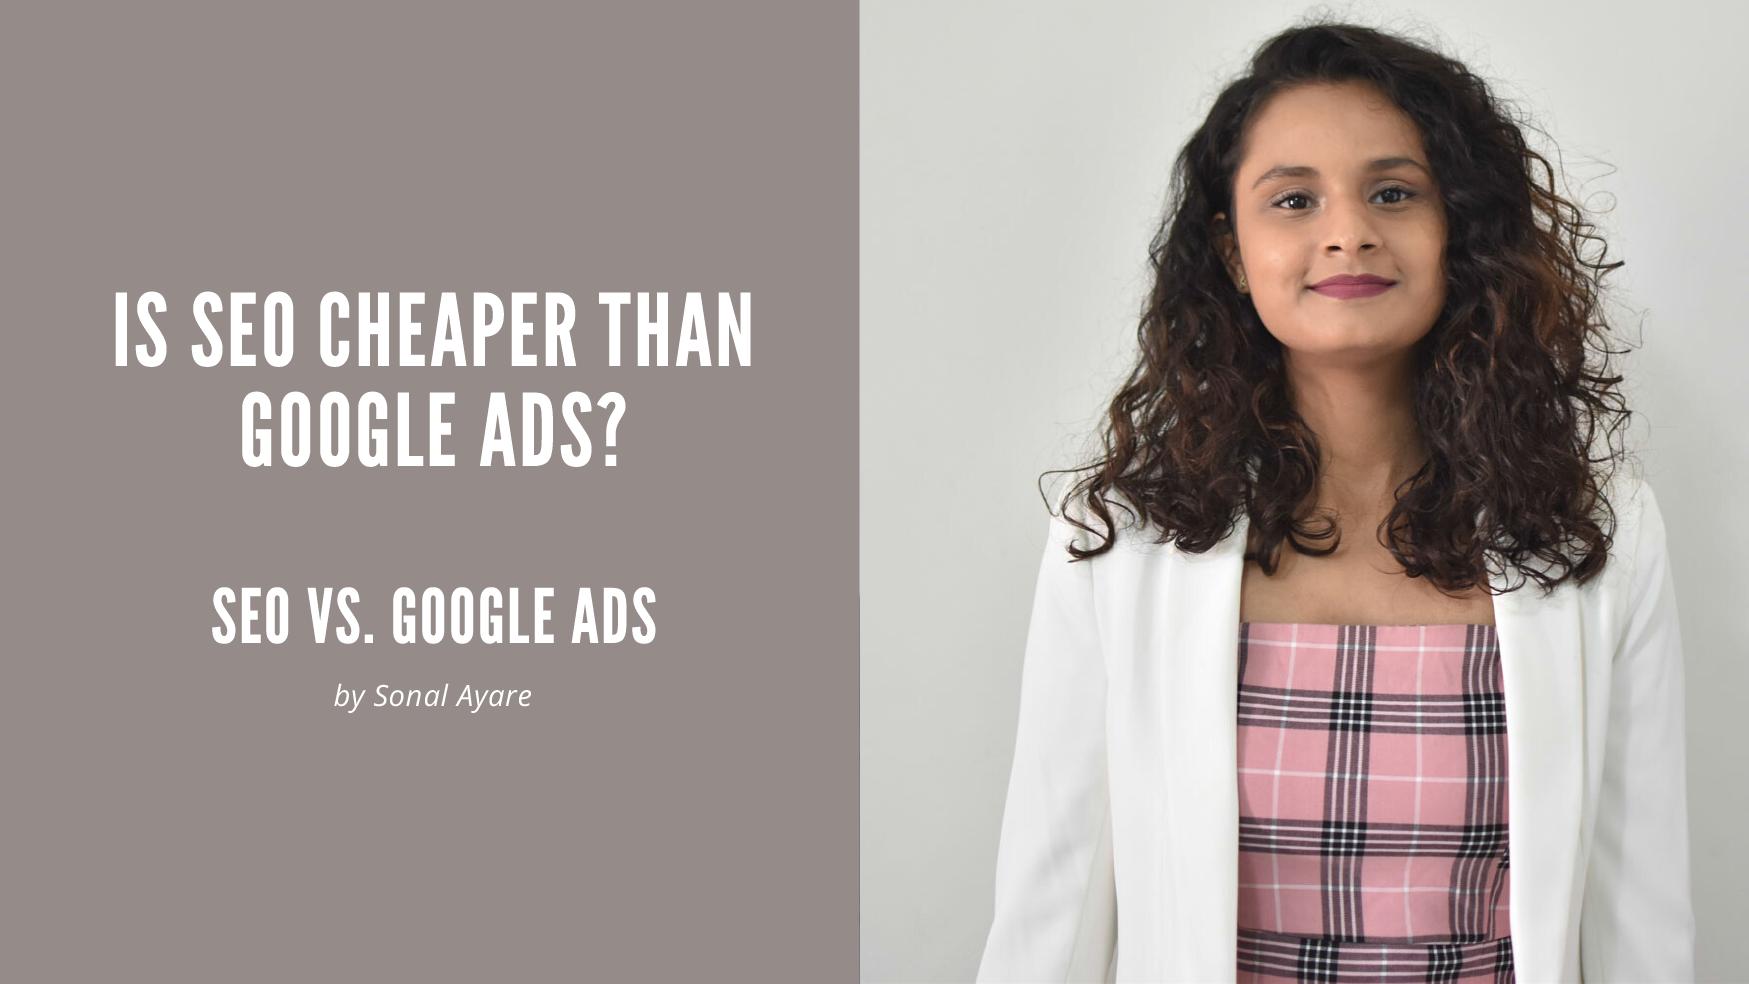 Is SEO Cheaper Than Google Ads? Seo vs. Google ads